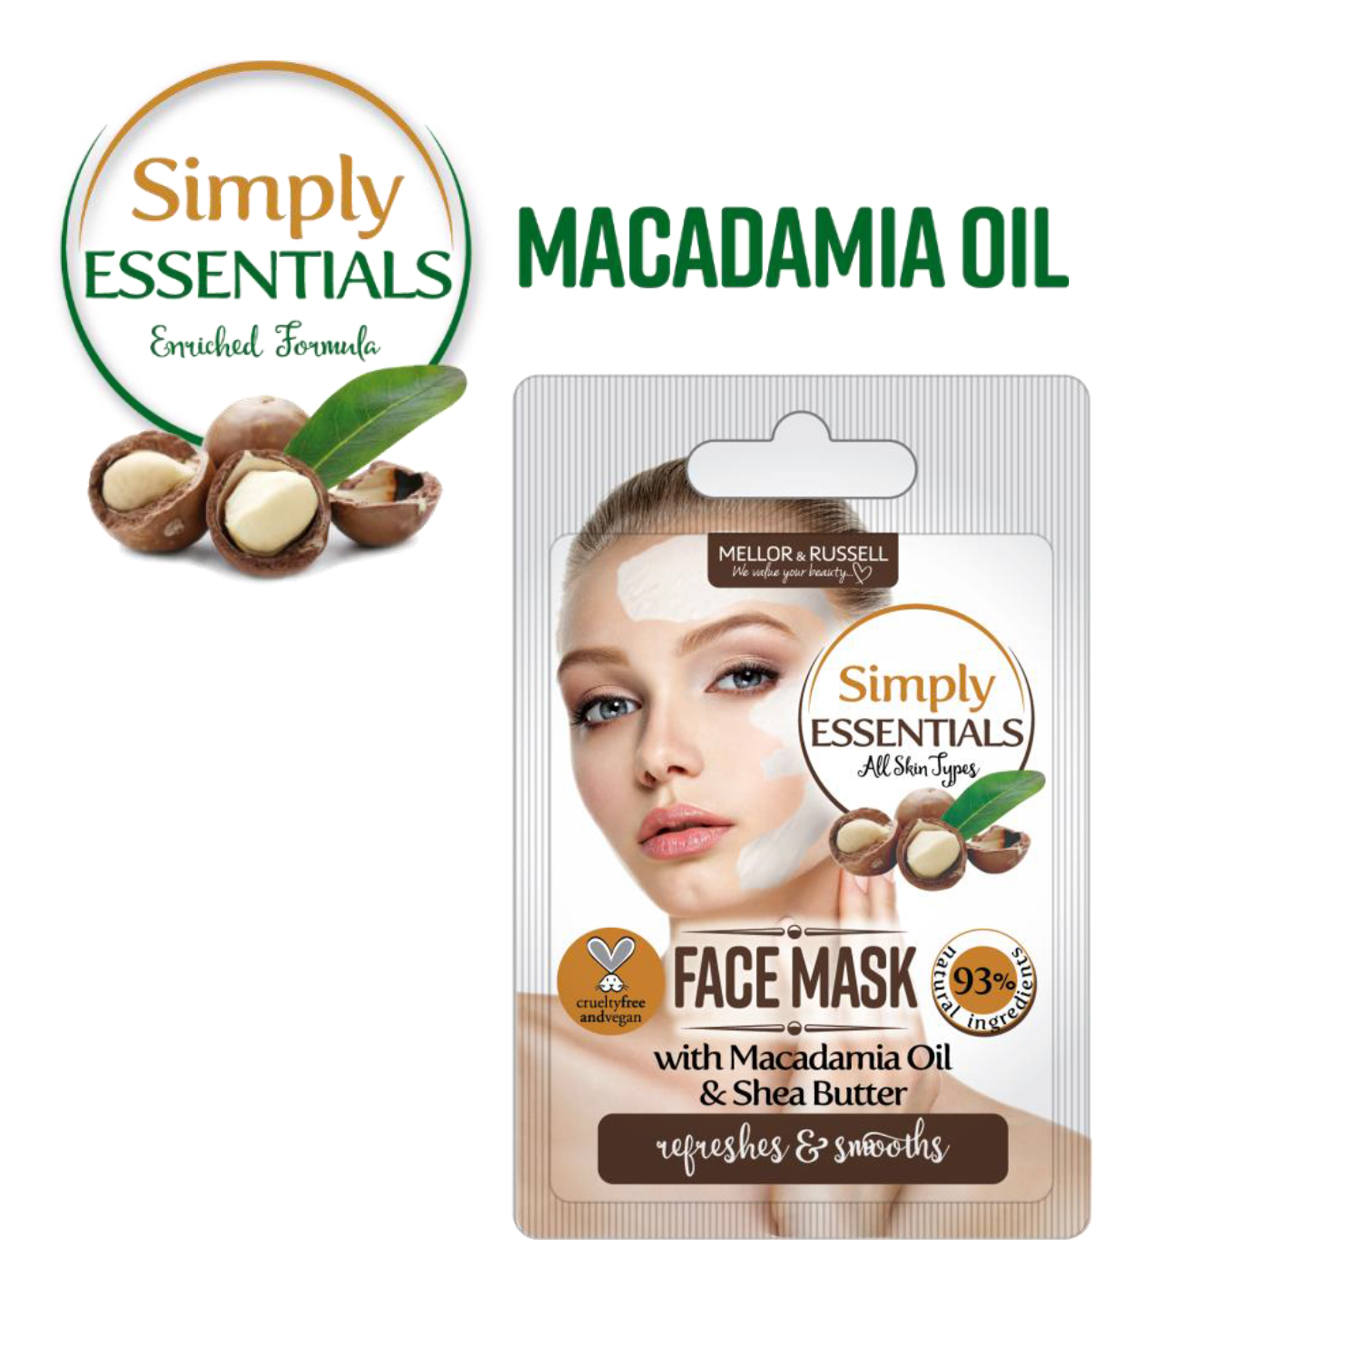 Simply Essentials Macadamia Oil Маска для лица с маслом Макадамии, 7 мл, саше